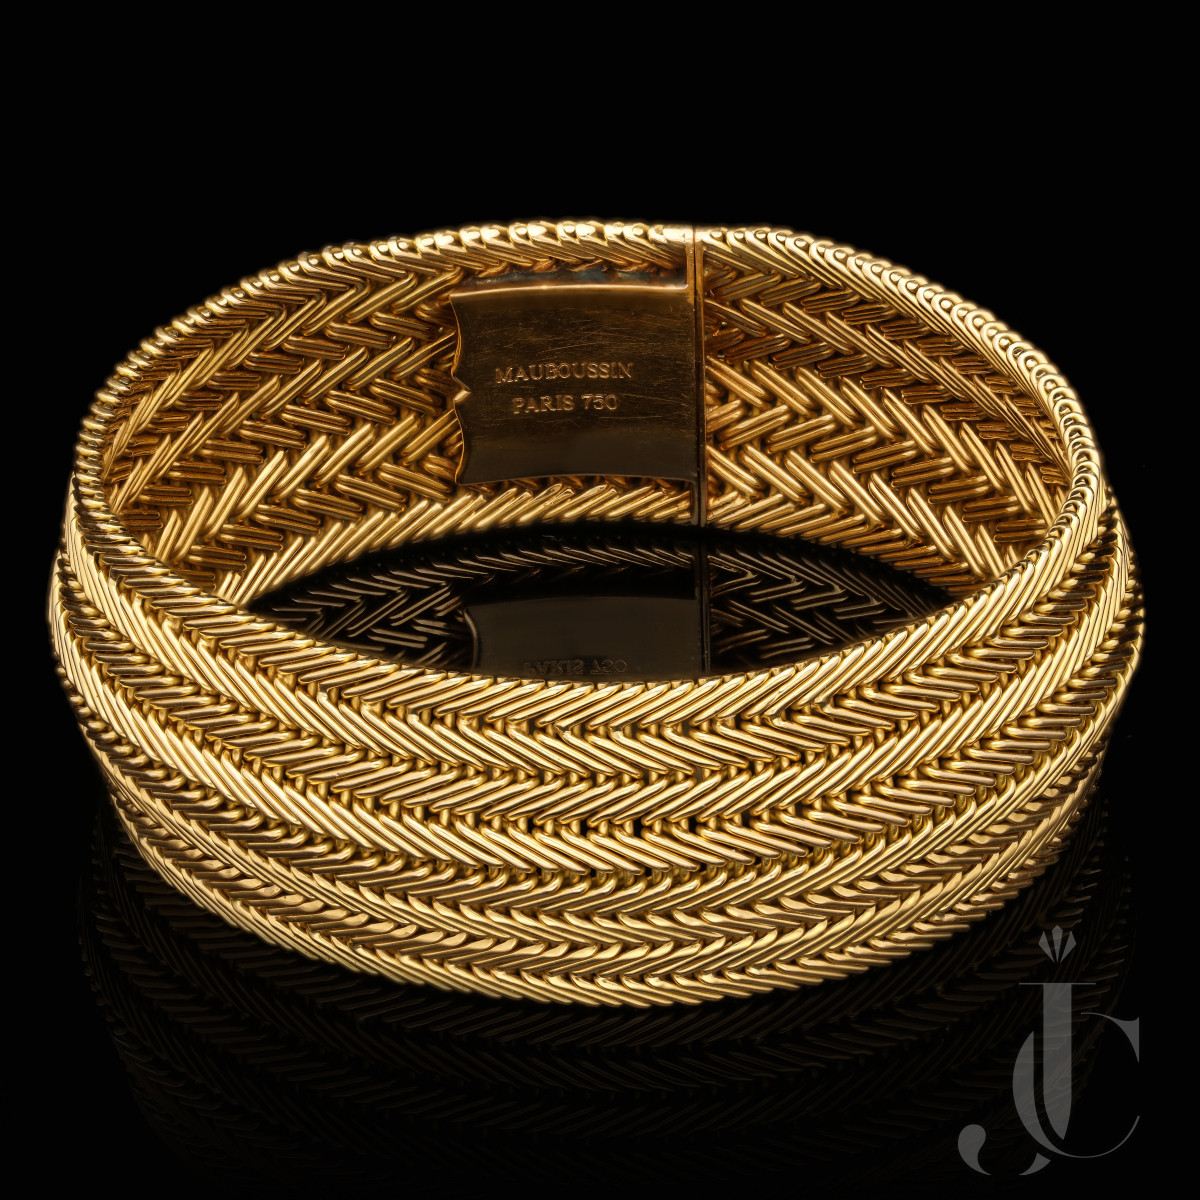 Mauboussin - French Vintage Gold Bracelet 1957